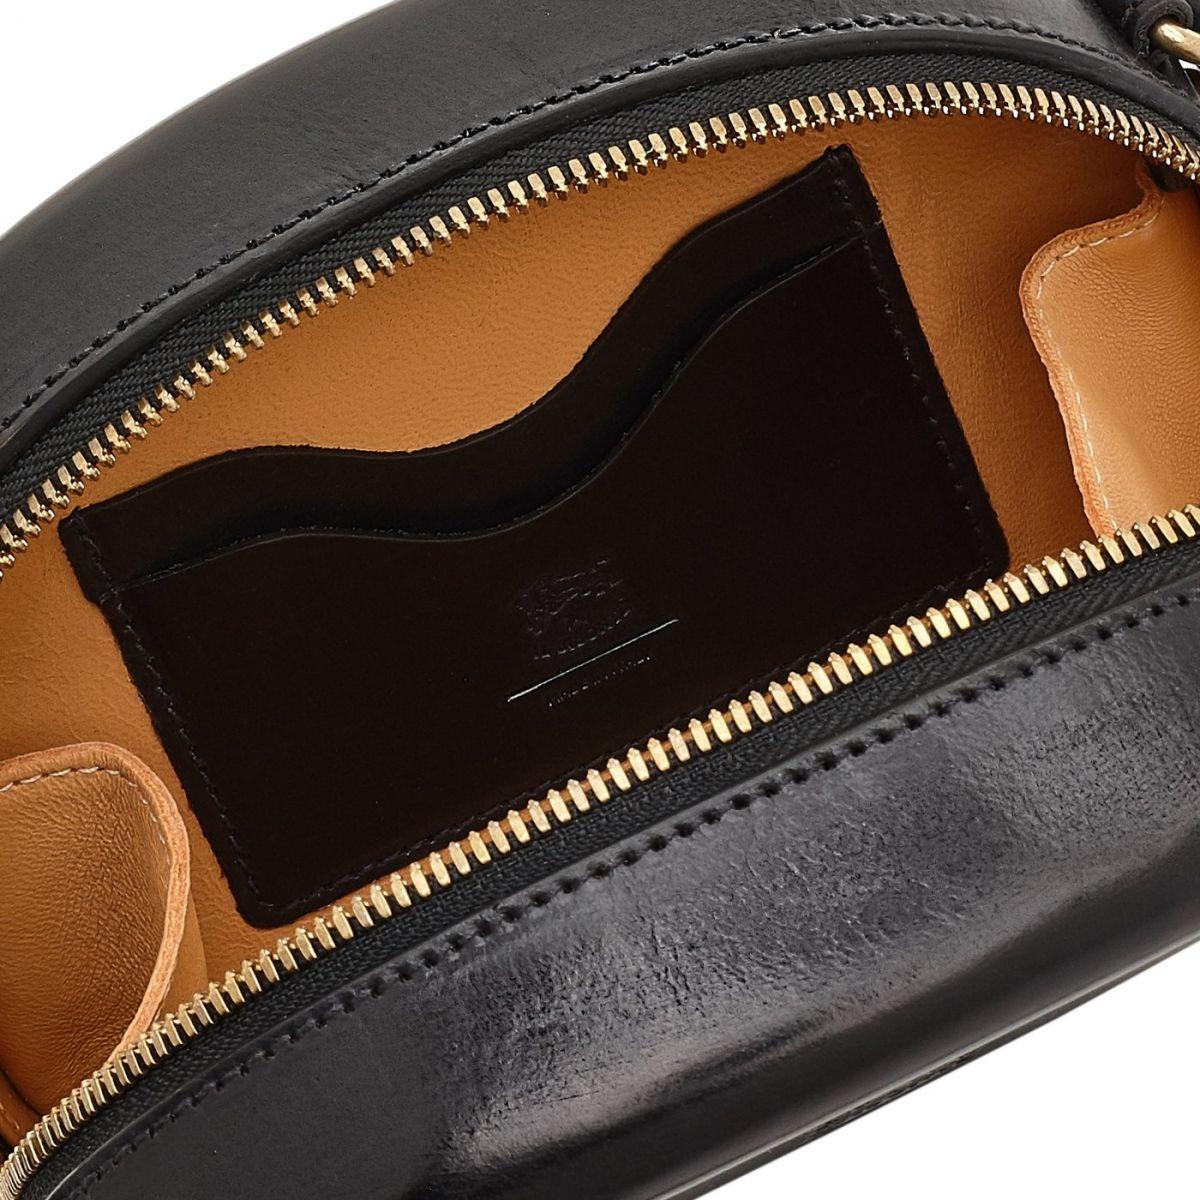 Women's Crossbody Bag  in Leather BCR147 color Black | Details